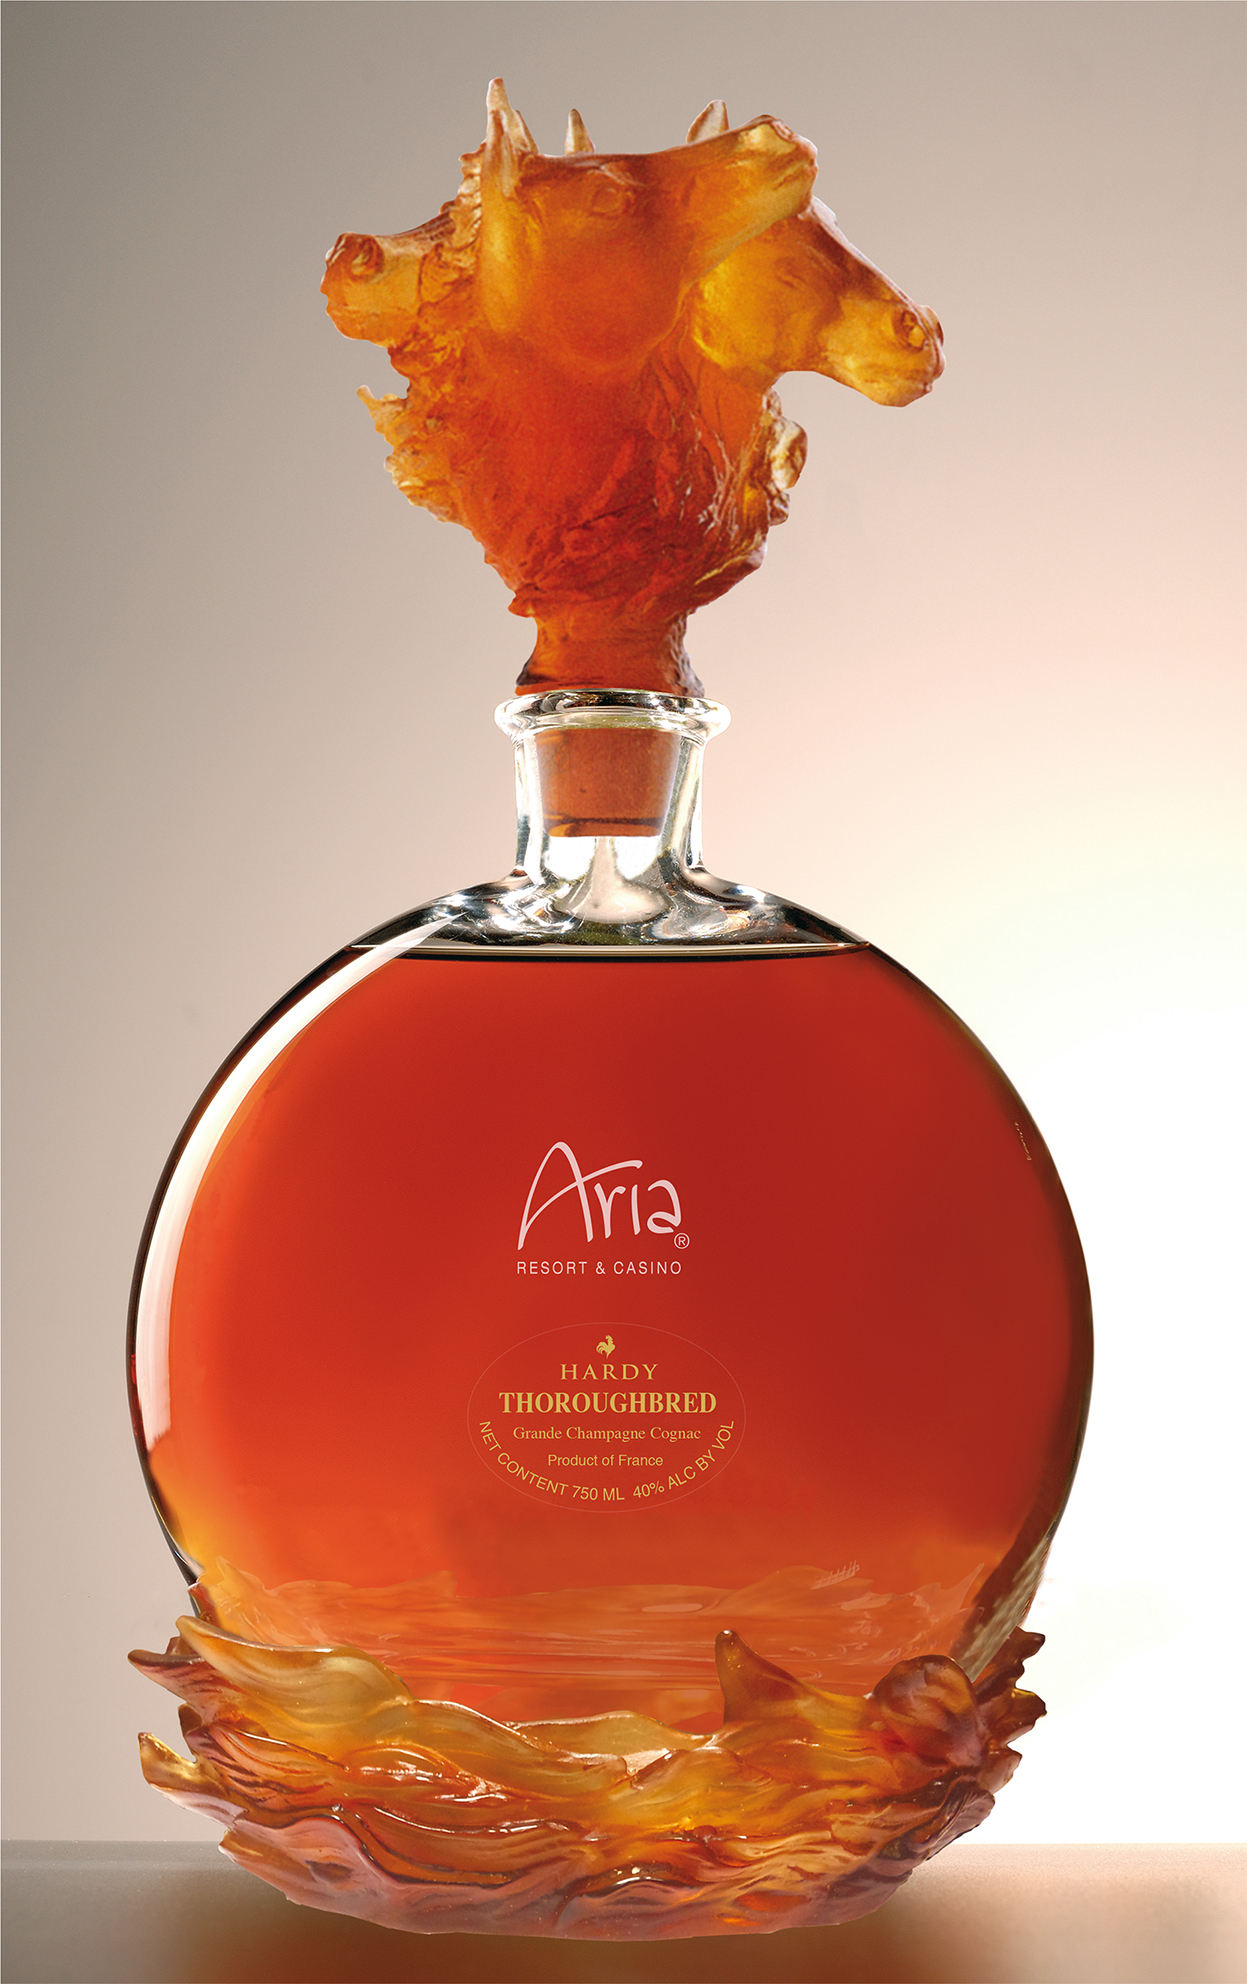 Aria's Thoroughbred cognac